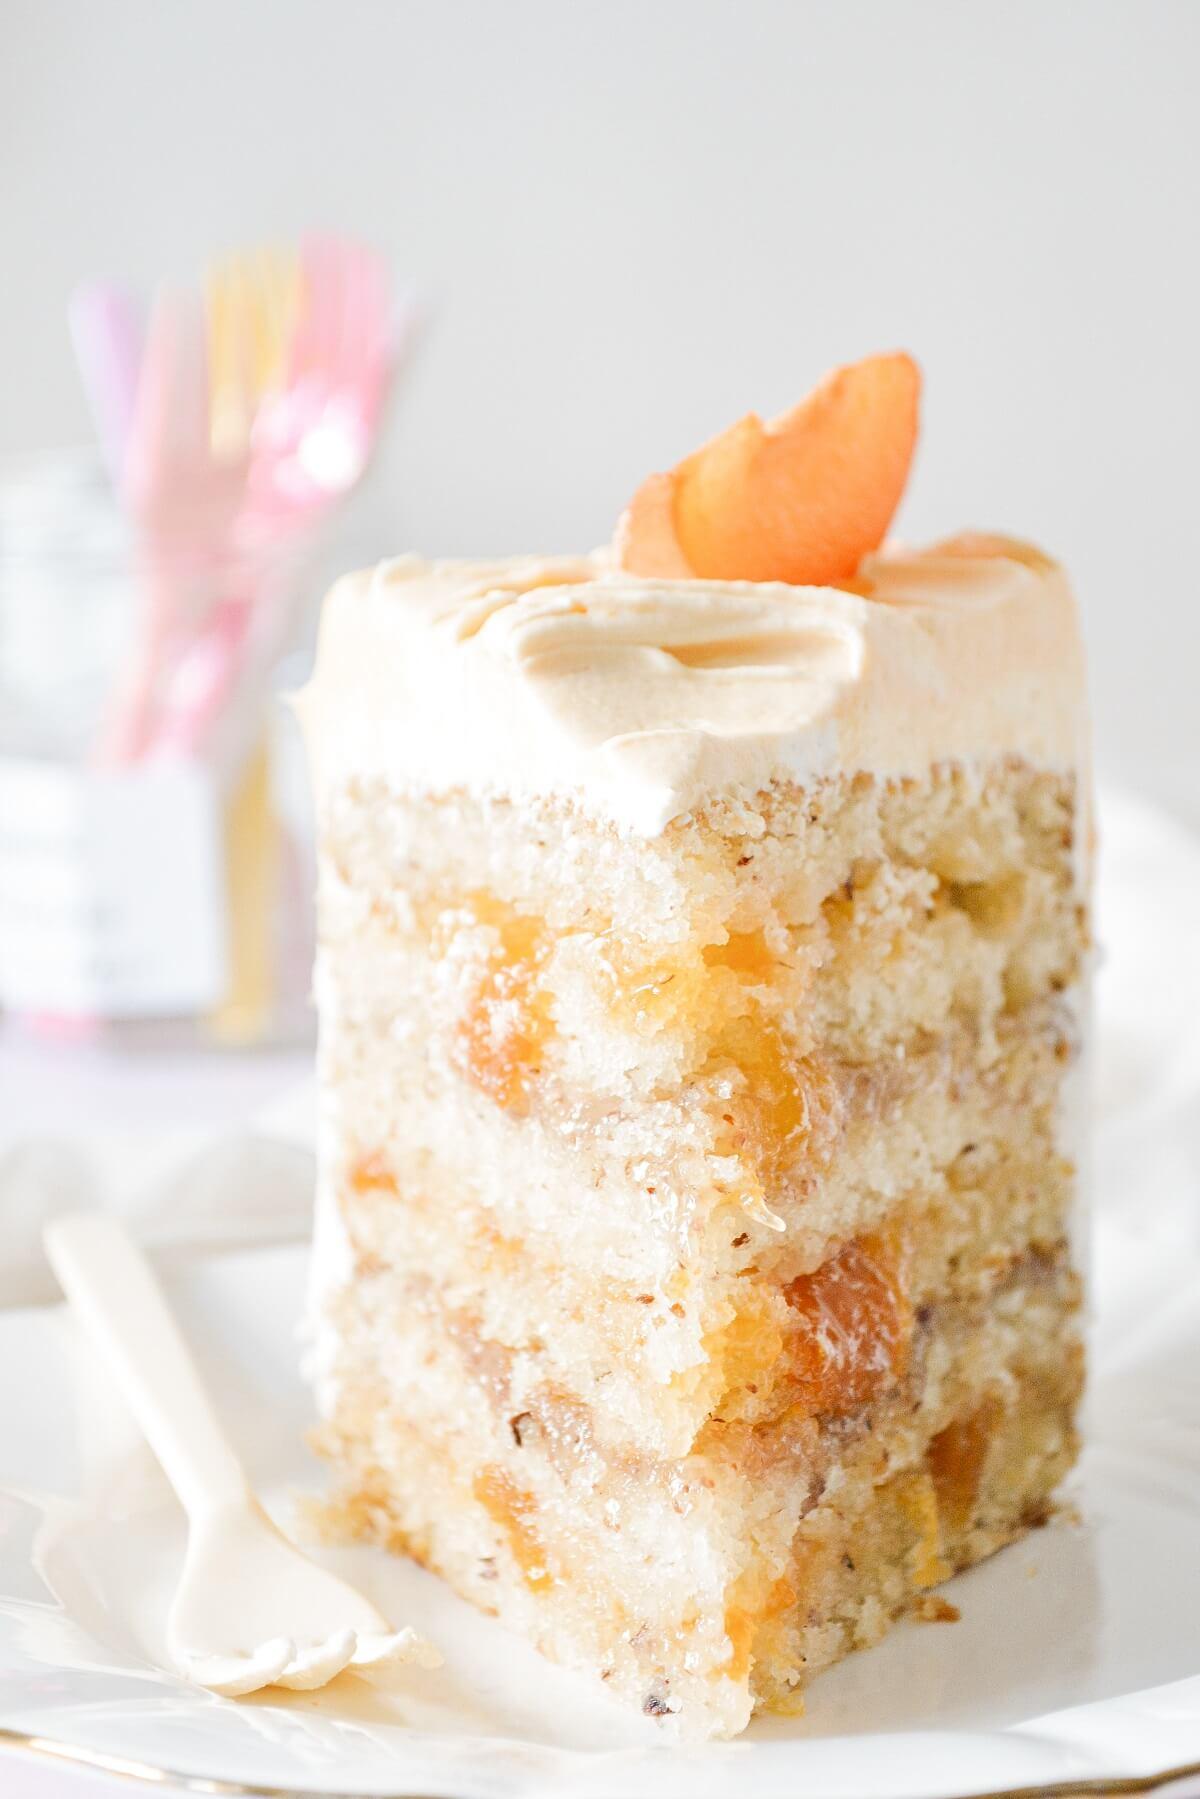 A slice of apricot almond cake.